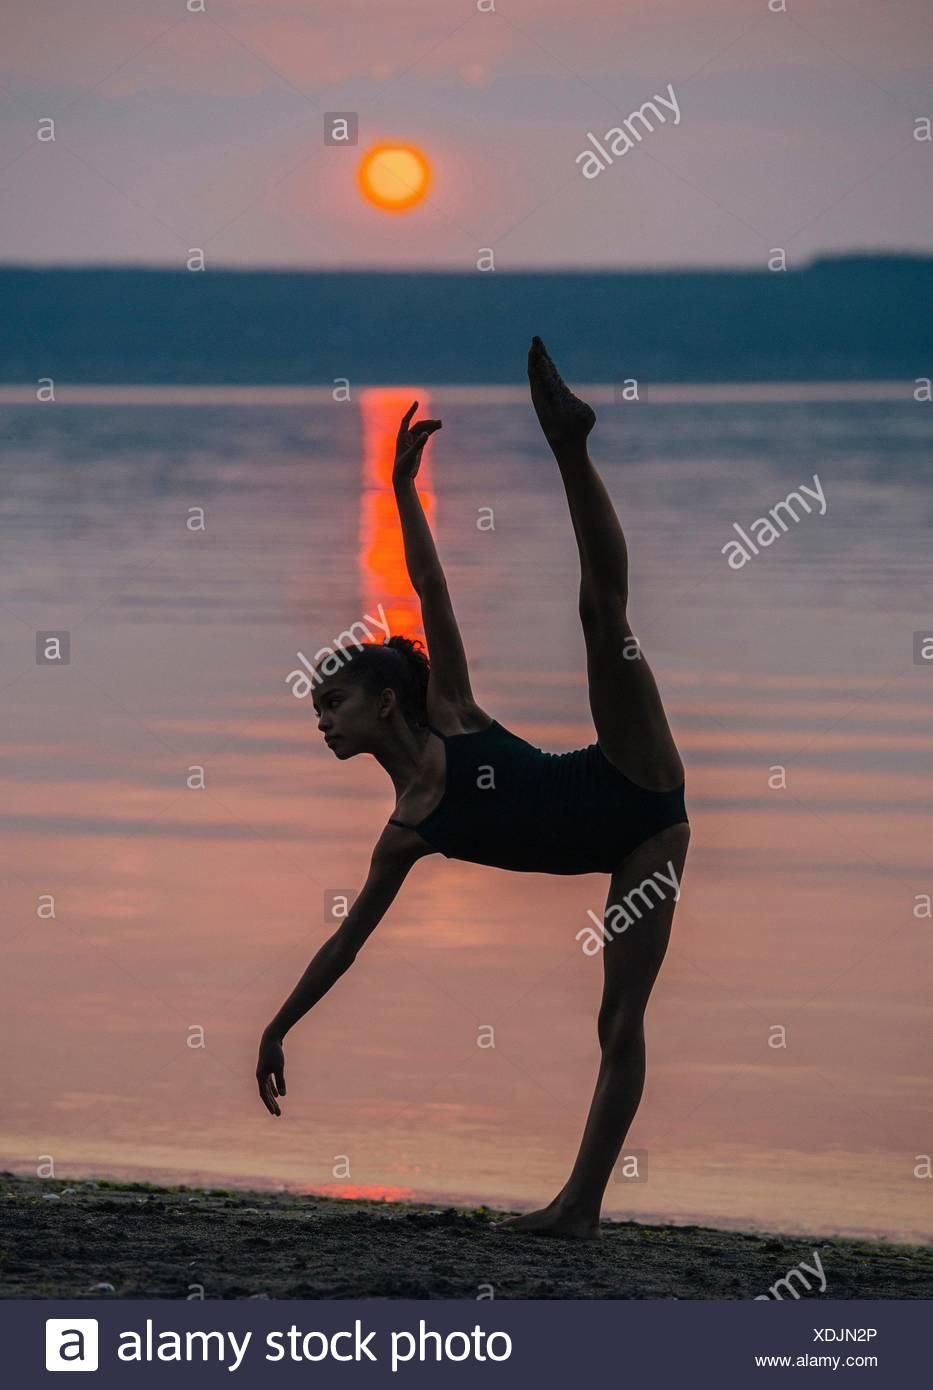 Girl by ocean at sunset on one leg, bending forward arm and leg raised - Stock Image